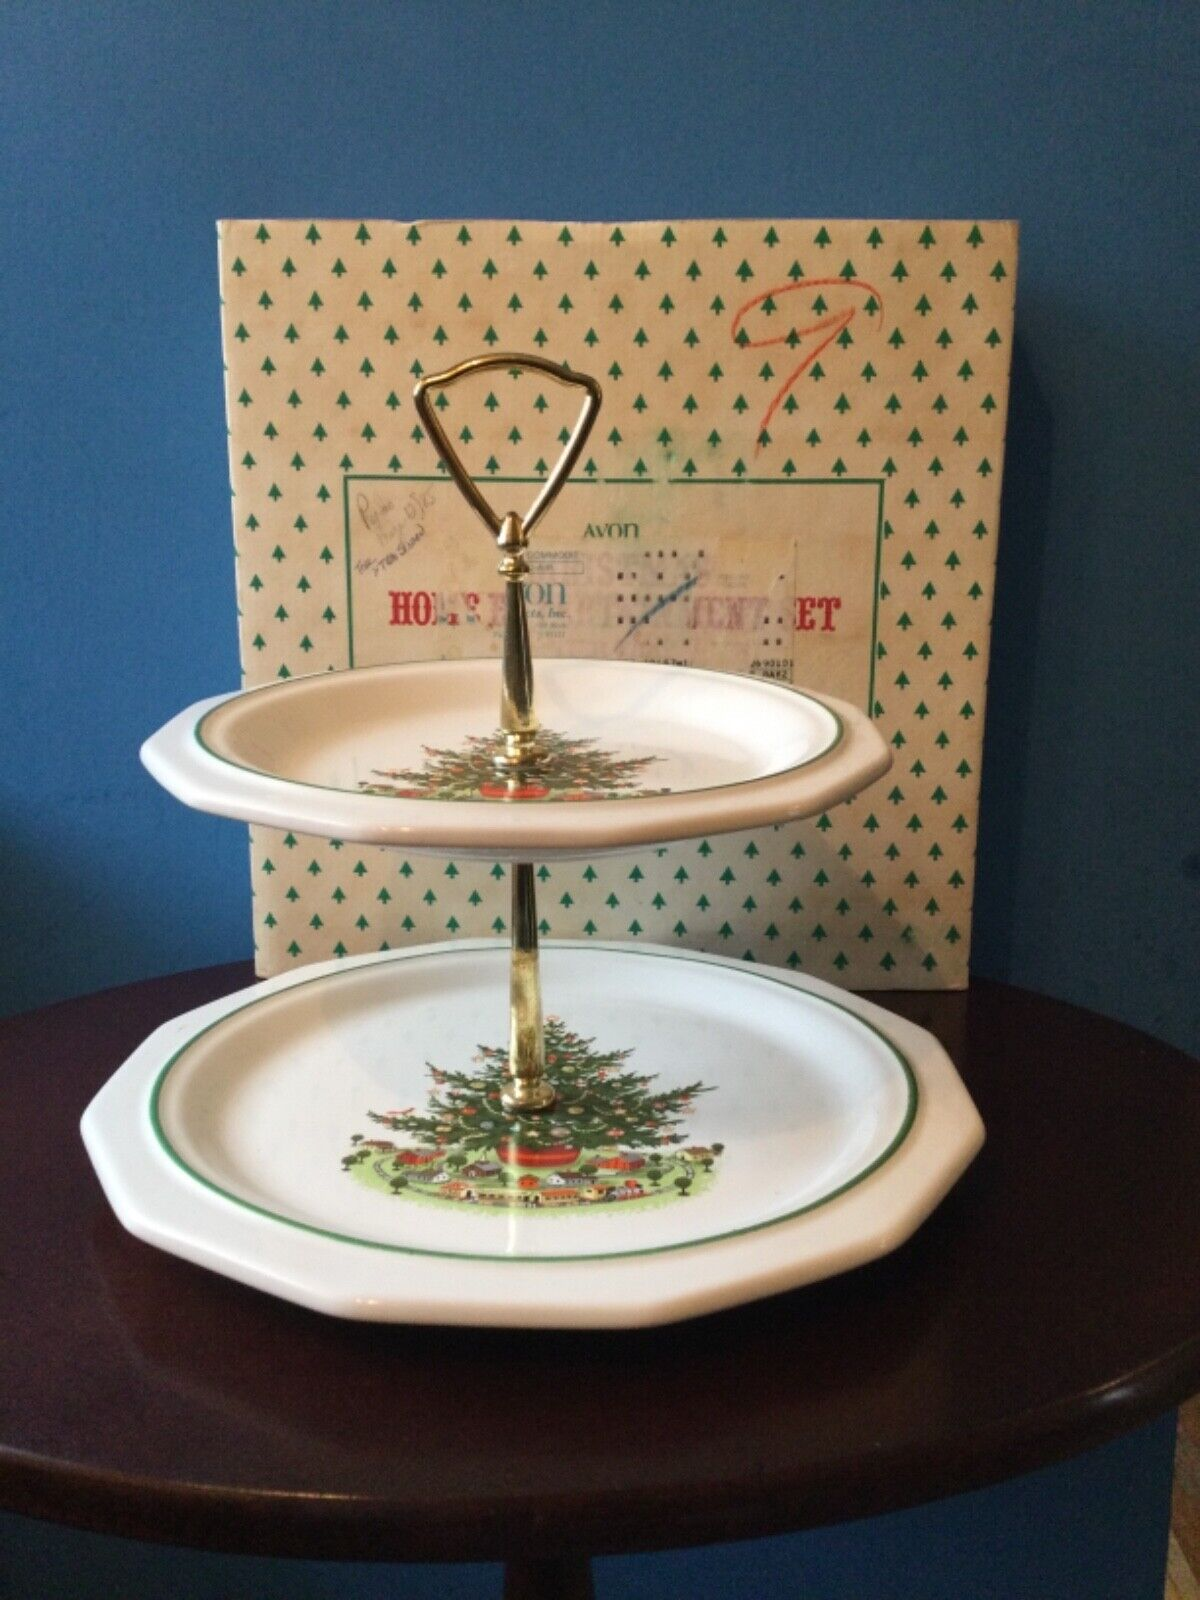 Avon / Pfaltzgraff Company Christmas Heritage Tier Tray - $18.00